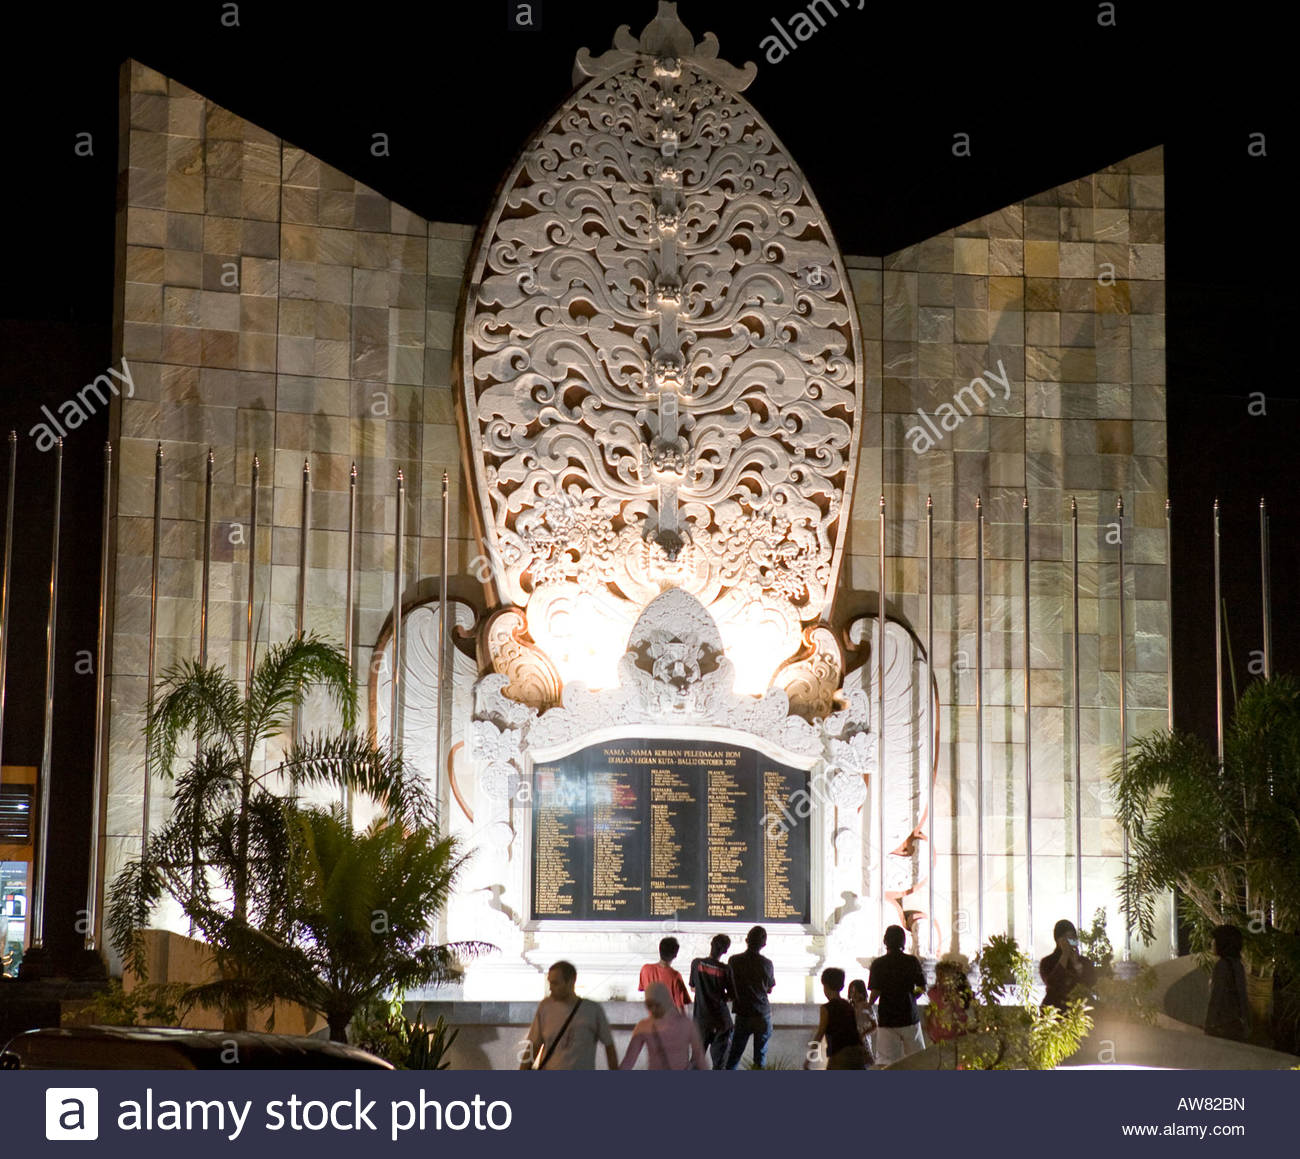 Bali Bombing Memorial Stock Photos Kuta Indonesia Image Kab Badung